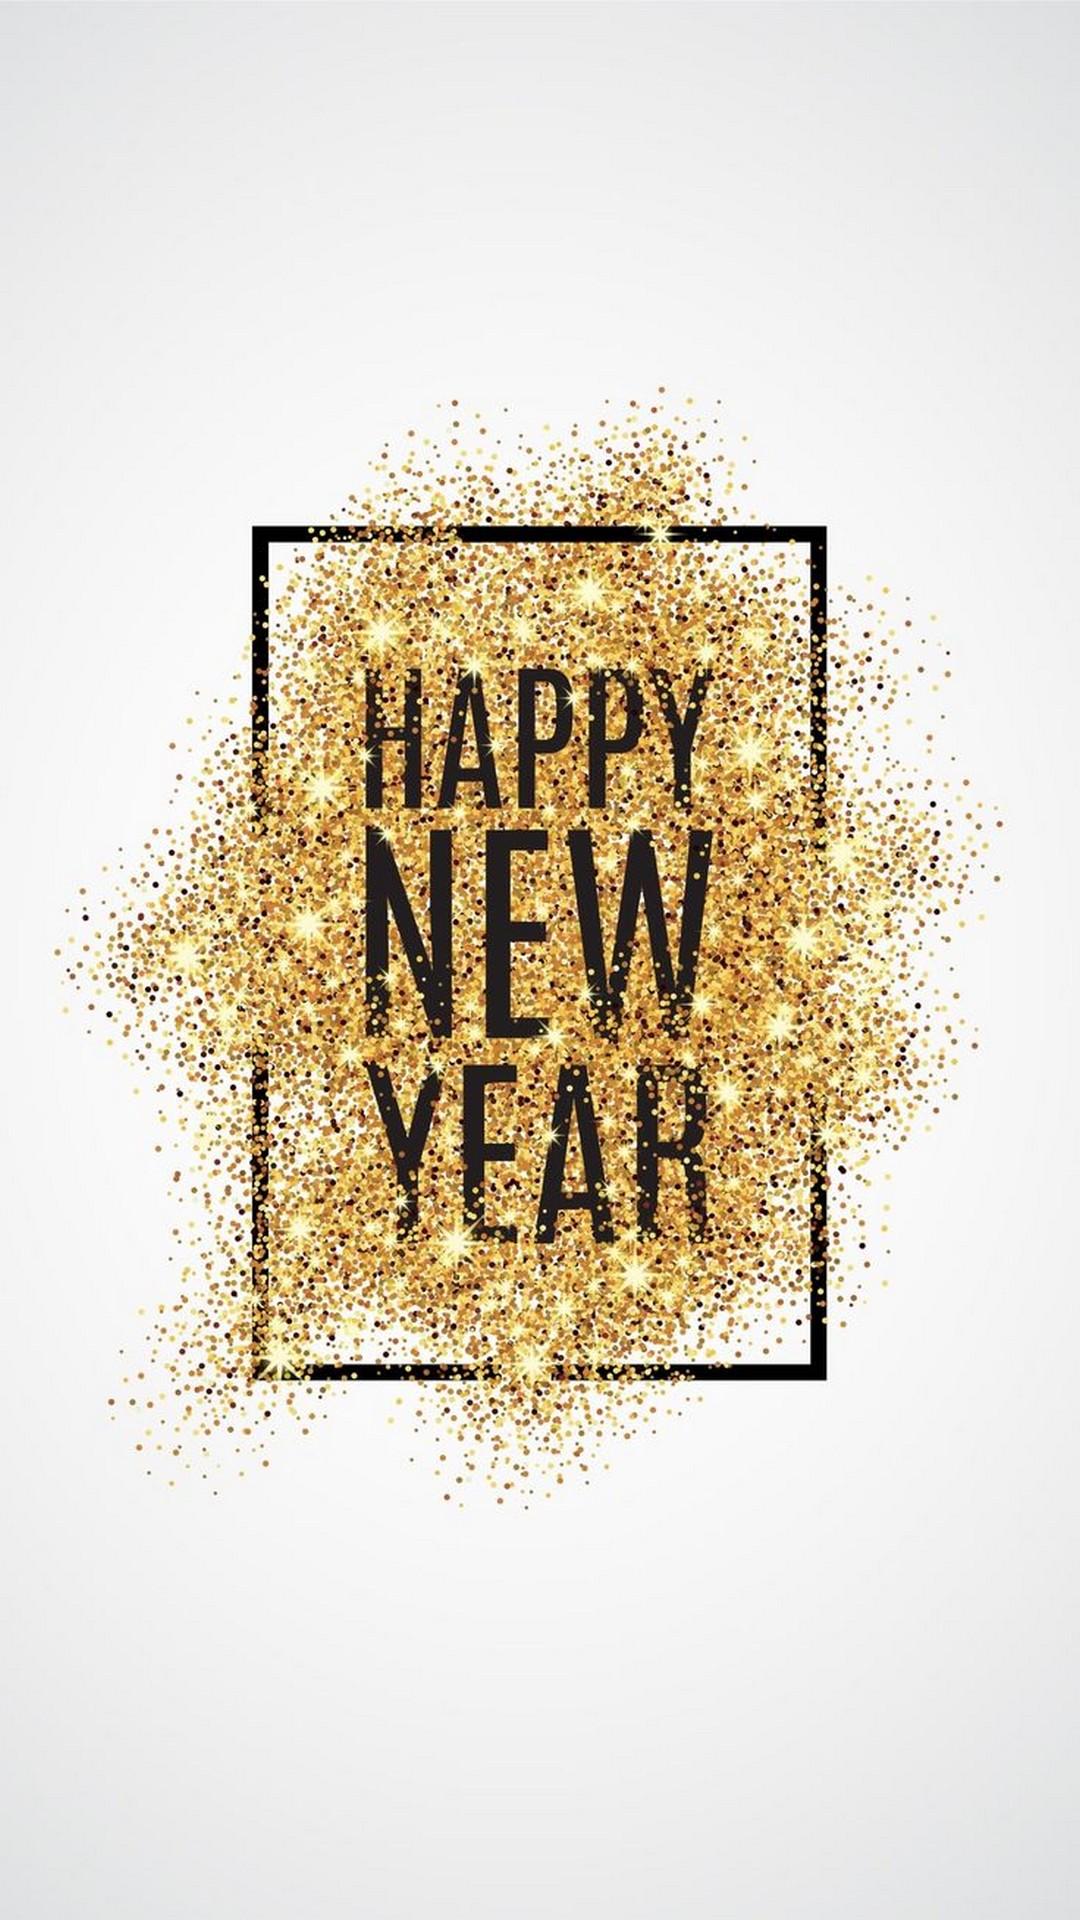 Iphone X Wallpaper Happy New Year